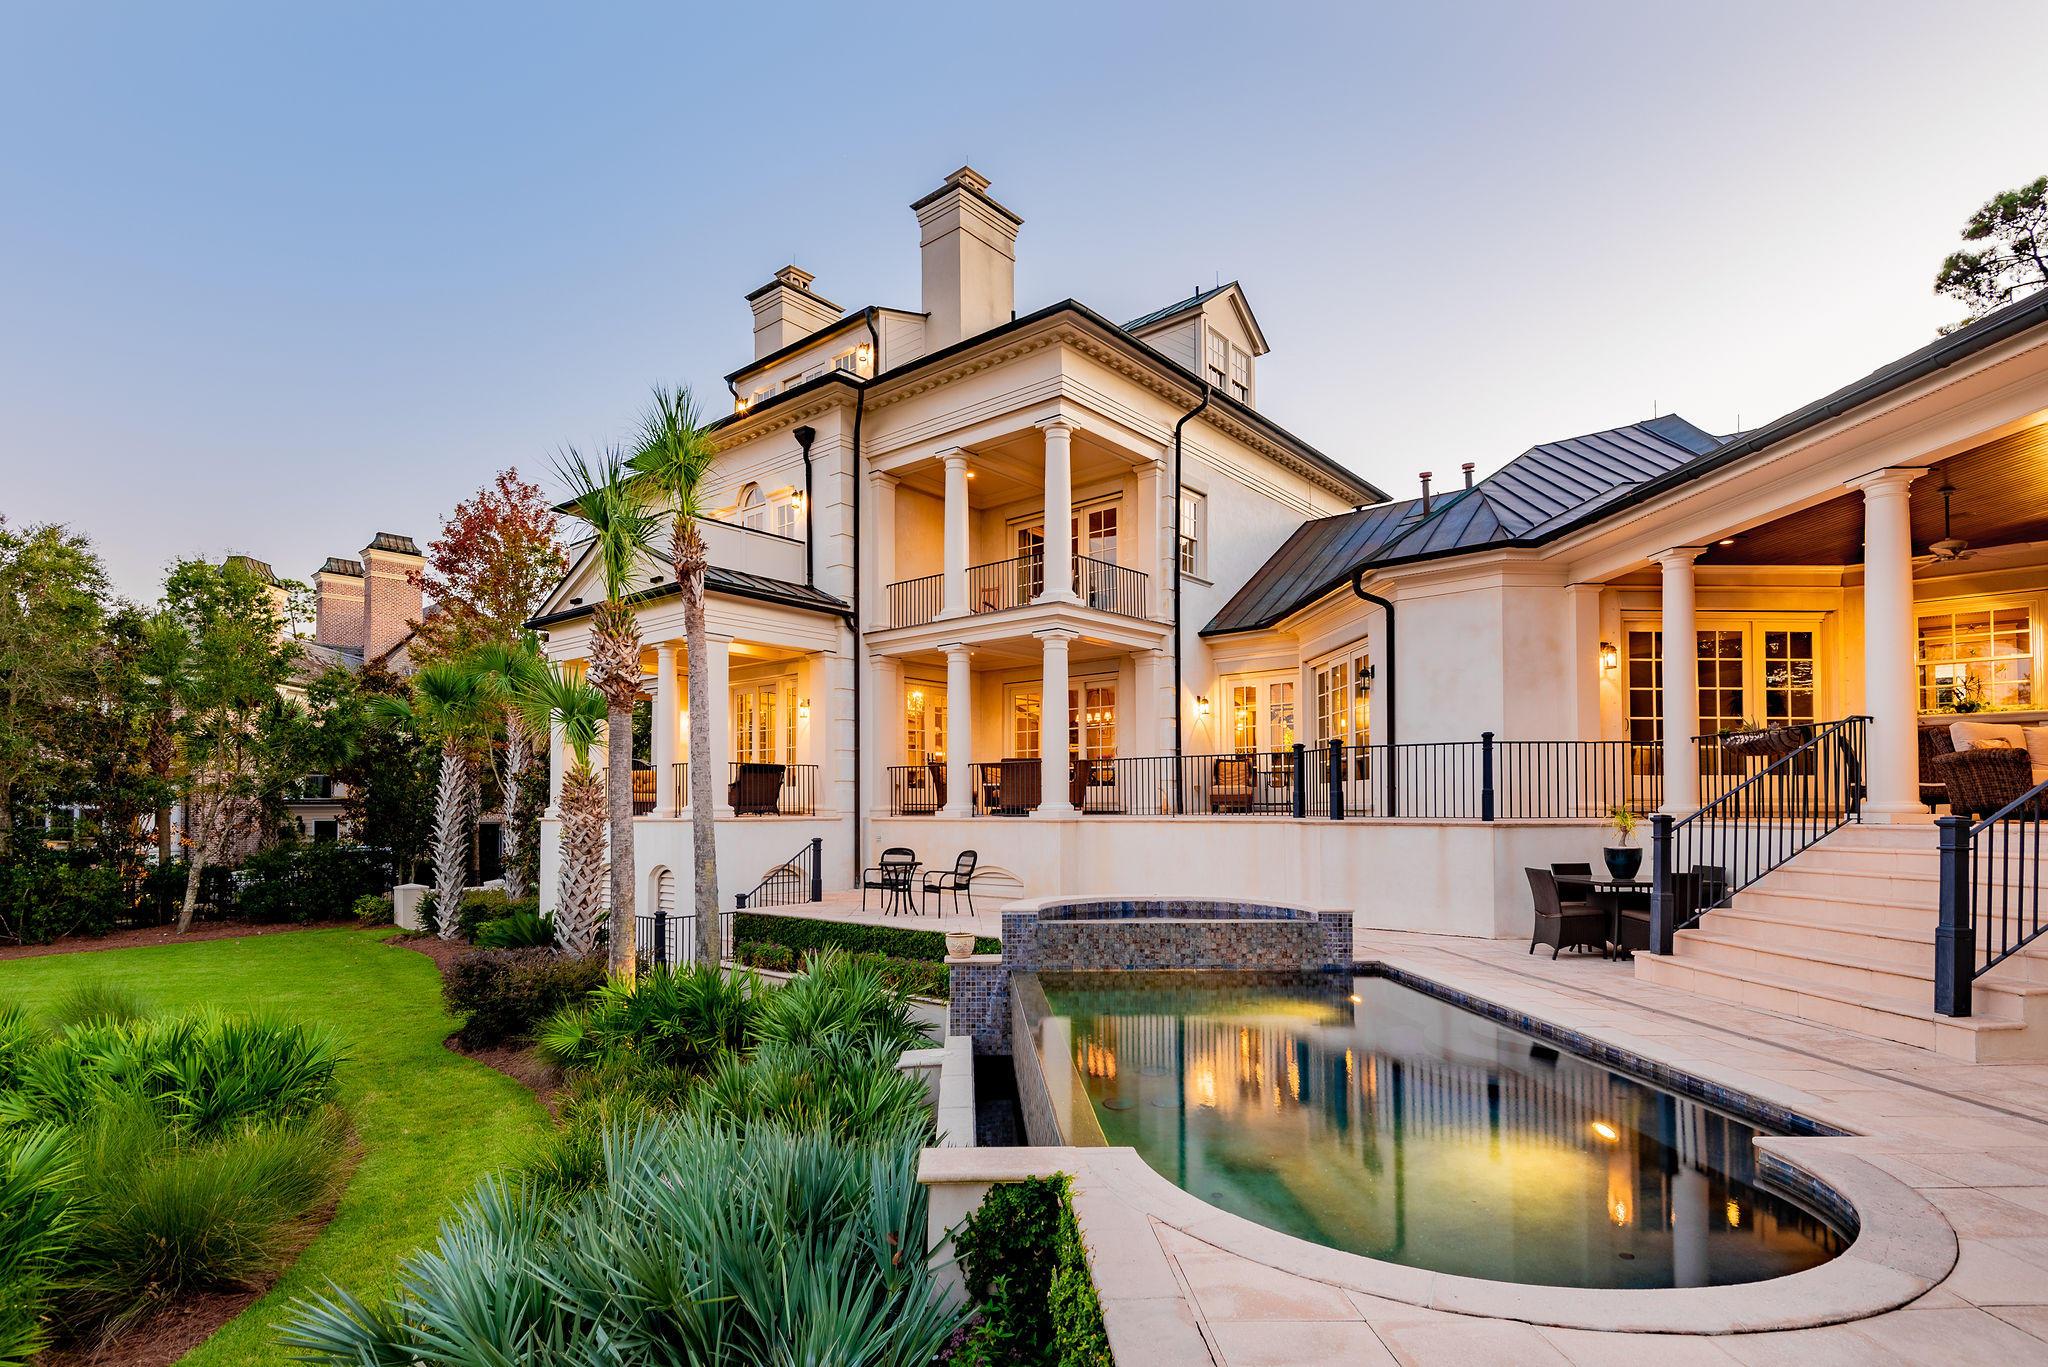 Daniel Island Homes For Sale - 394 Ralston Creek, Charleston, SC - 11